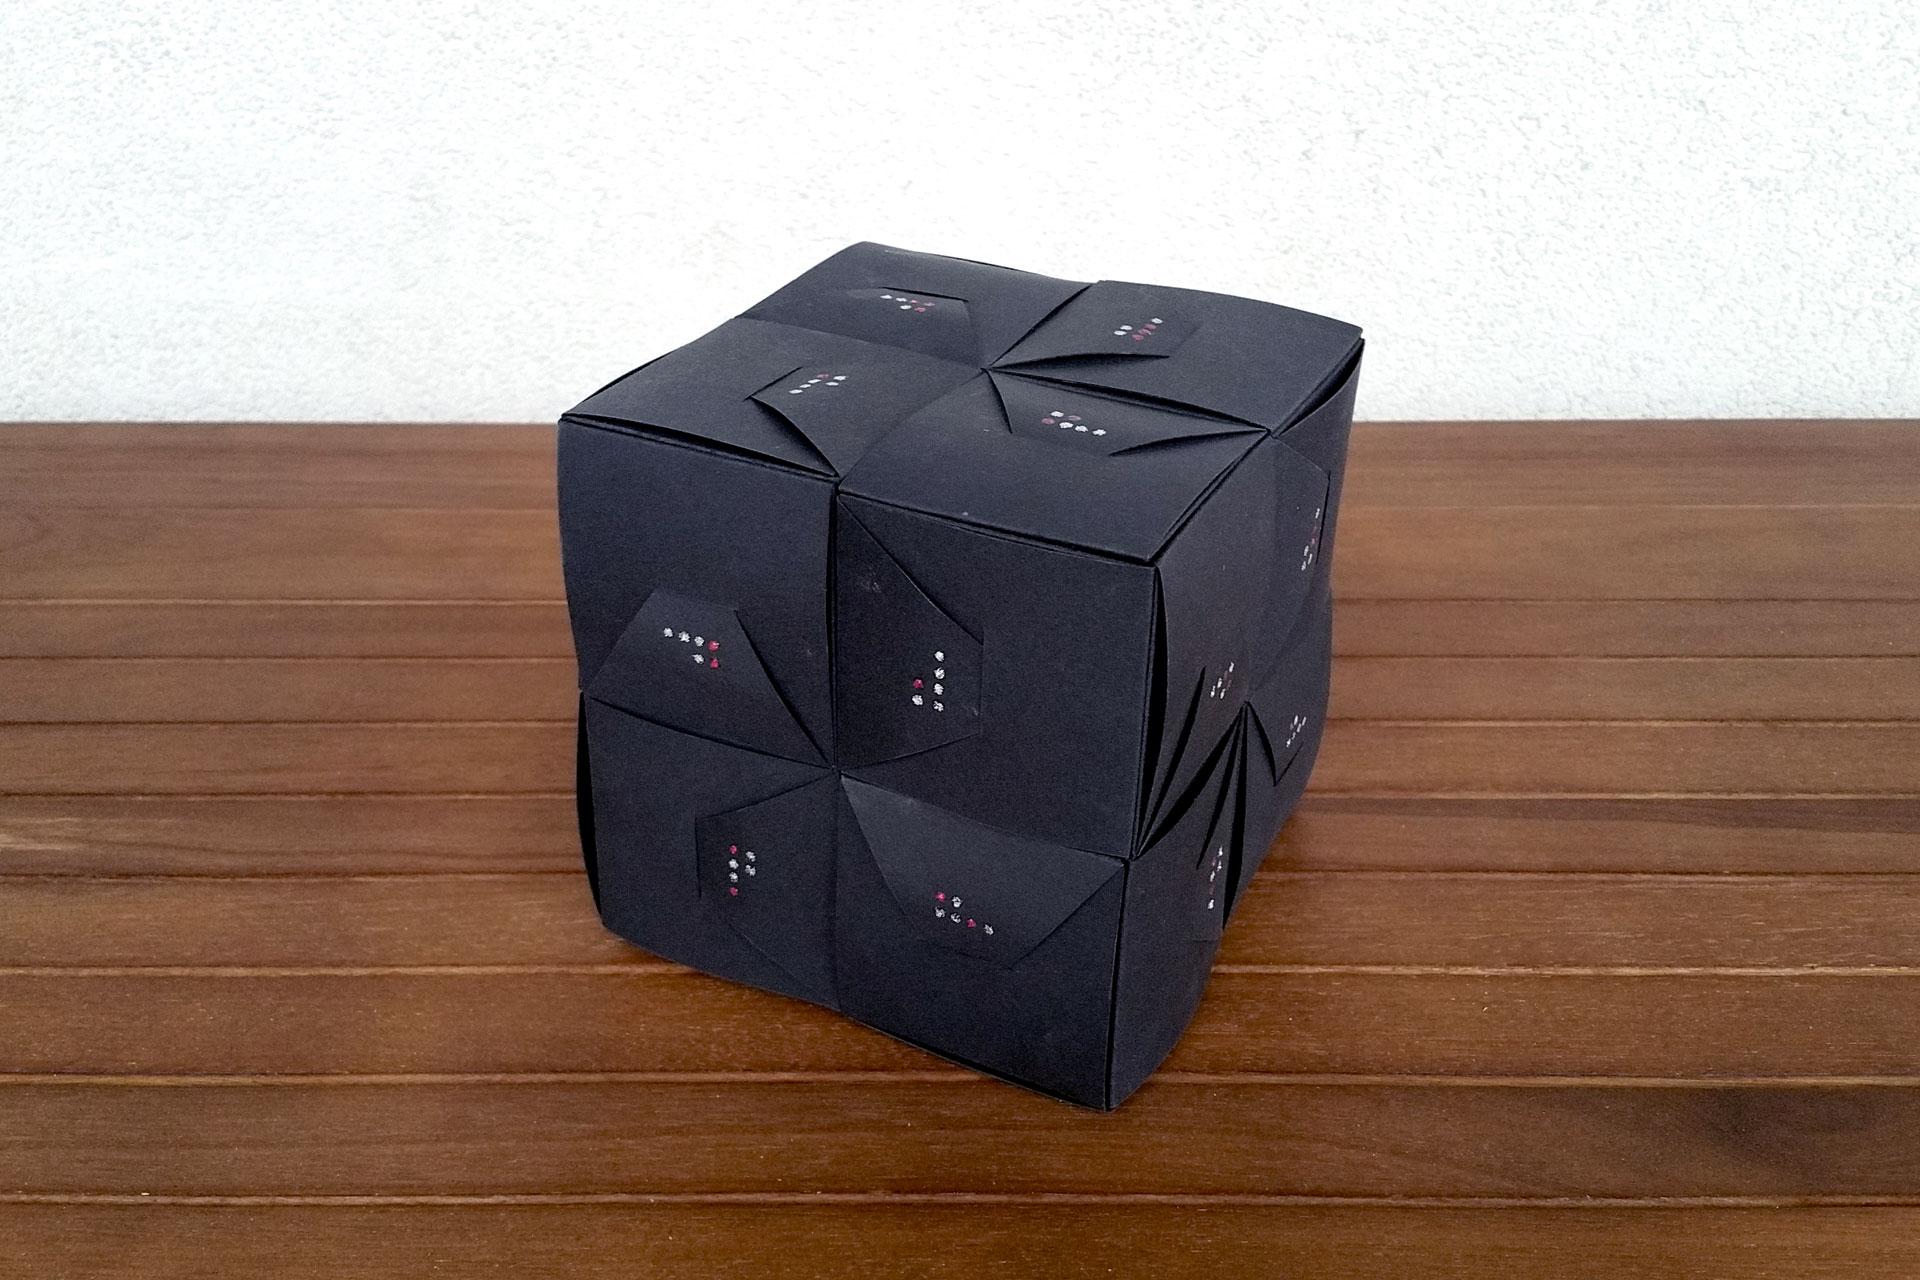 Binärer Christmas Cube: Adventkalender für faule Nerds